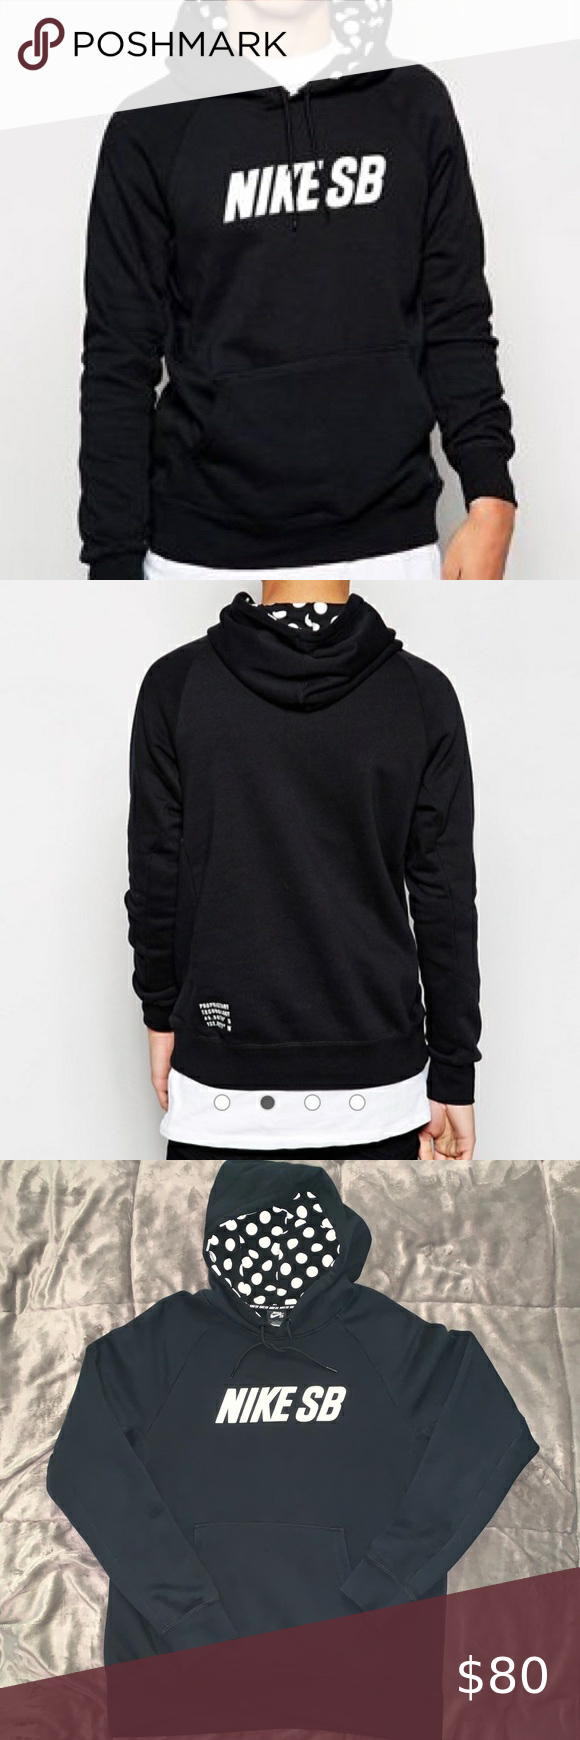 Nike Sb Hoodie With Polka Dot Hood Size L Hoodies Long Sleeve Tshirt Men Nike Sb [ 1740 x 580 Pixel ]